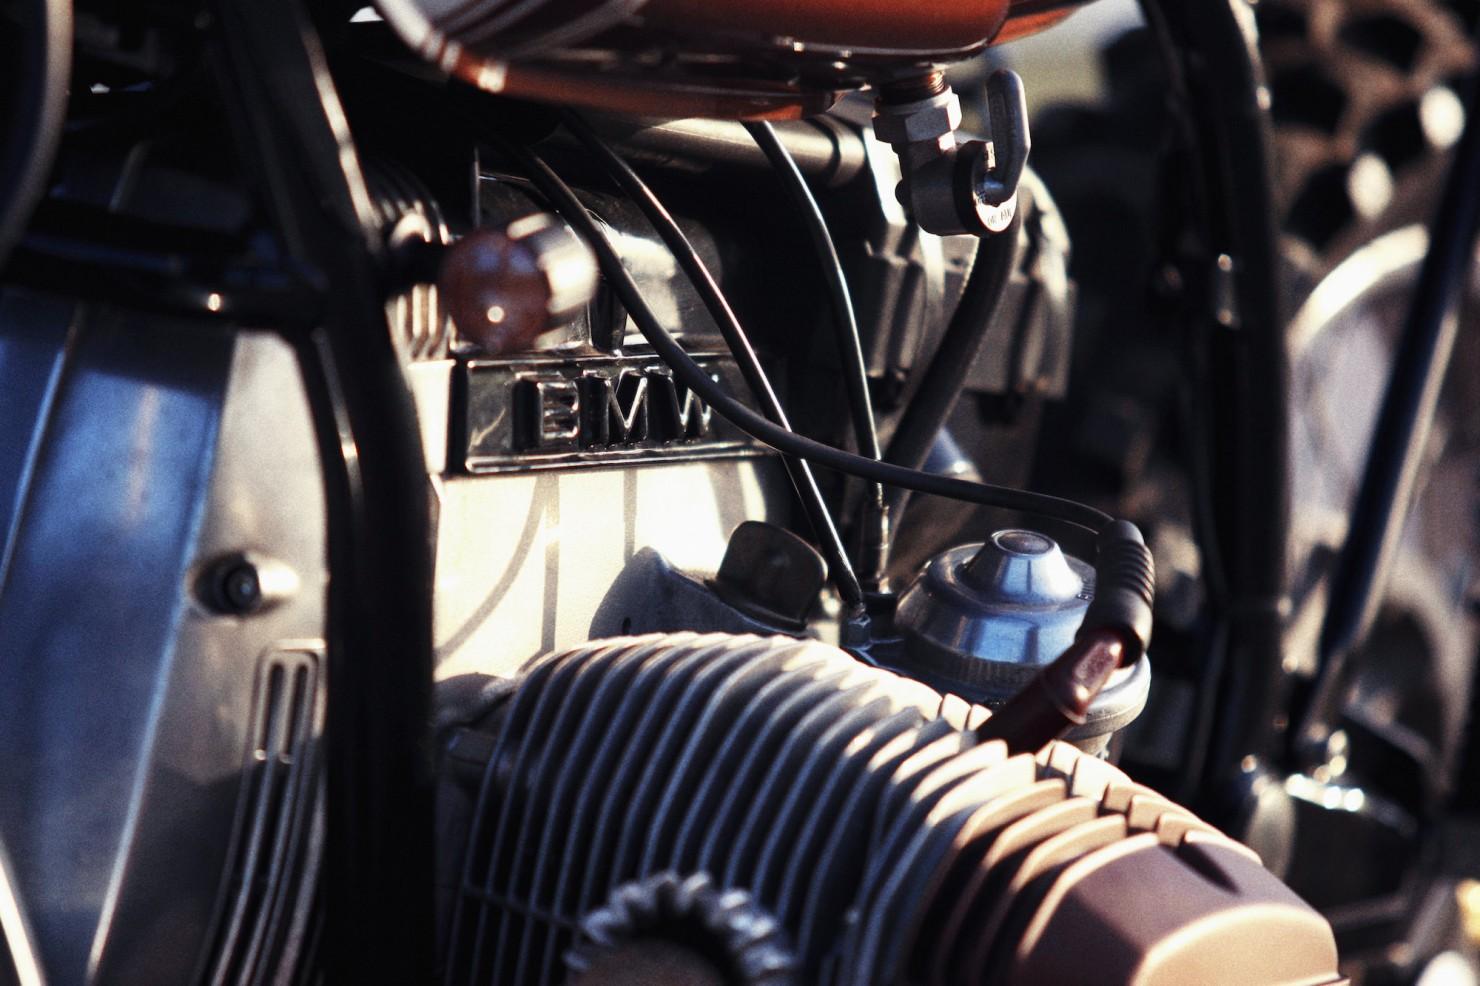 BMW-R45-Custom-Motorcycle-15-1480x986